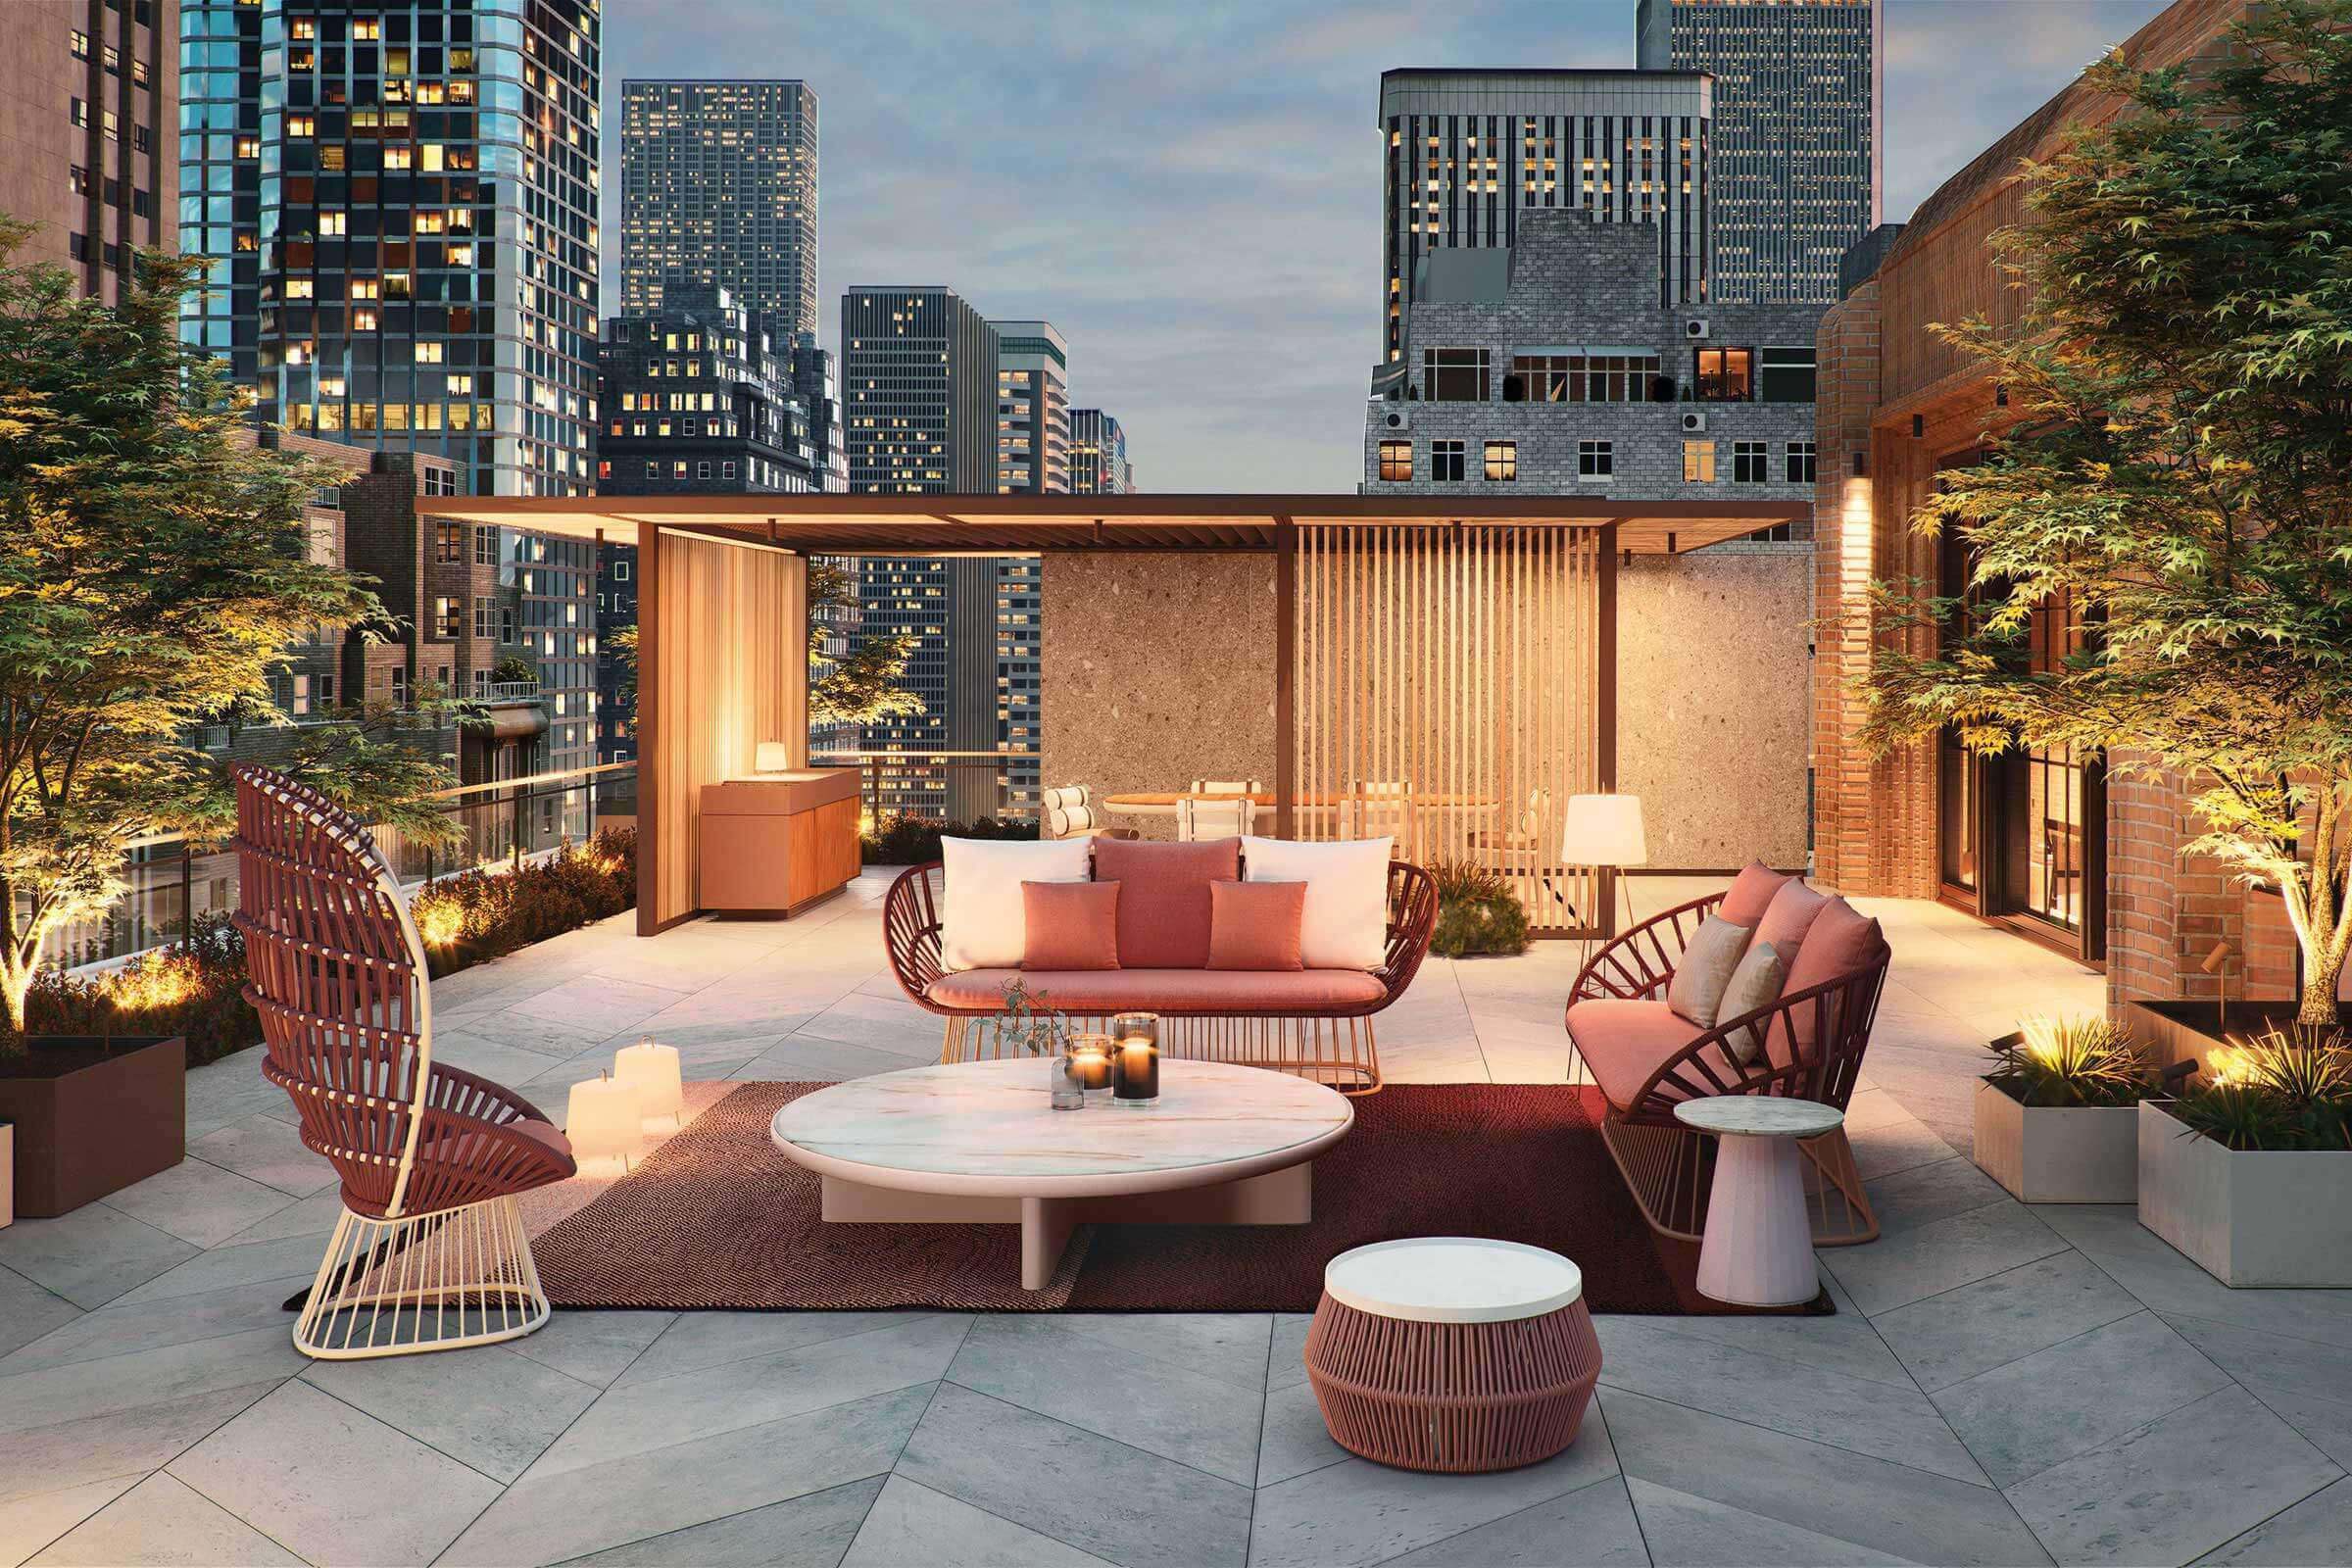 foto_slider_1542_0_nyc_terrace_cala_pavilion_1.jpg